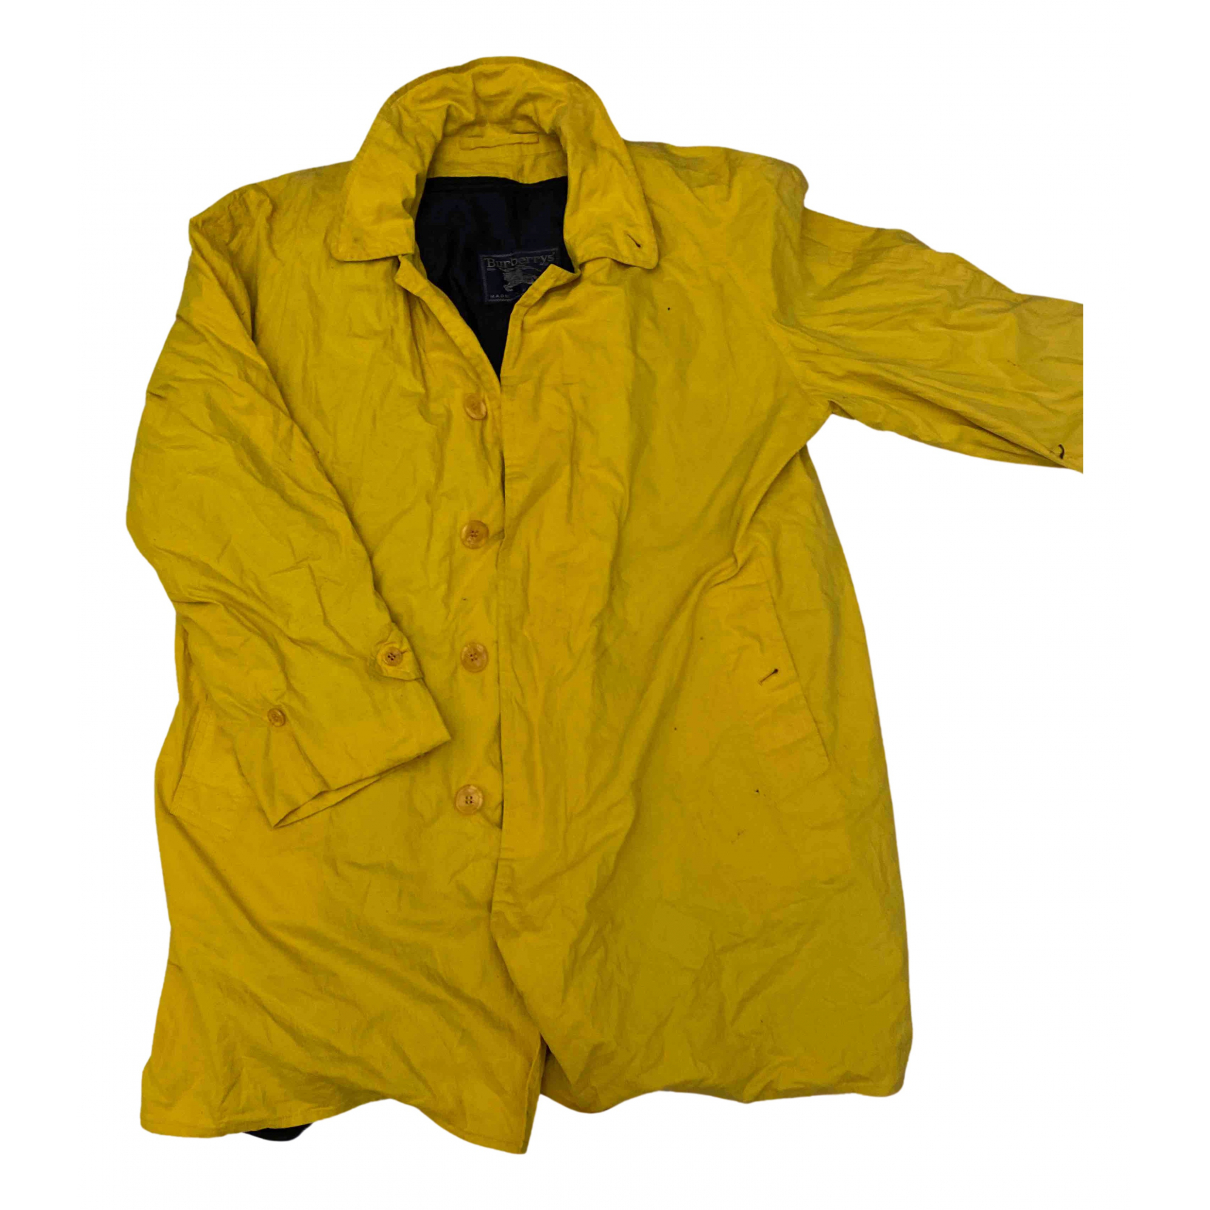 Burberry \N Yellow jacket  for Men L International